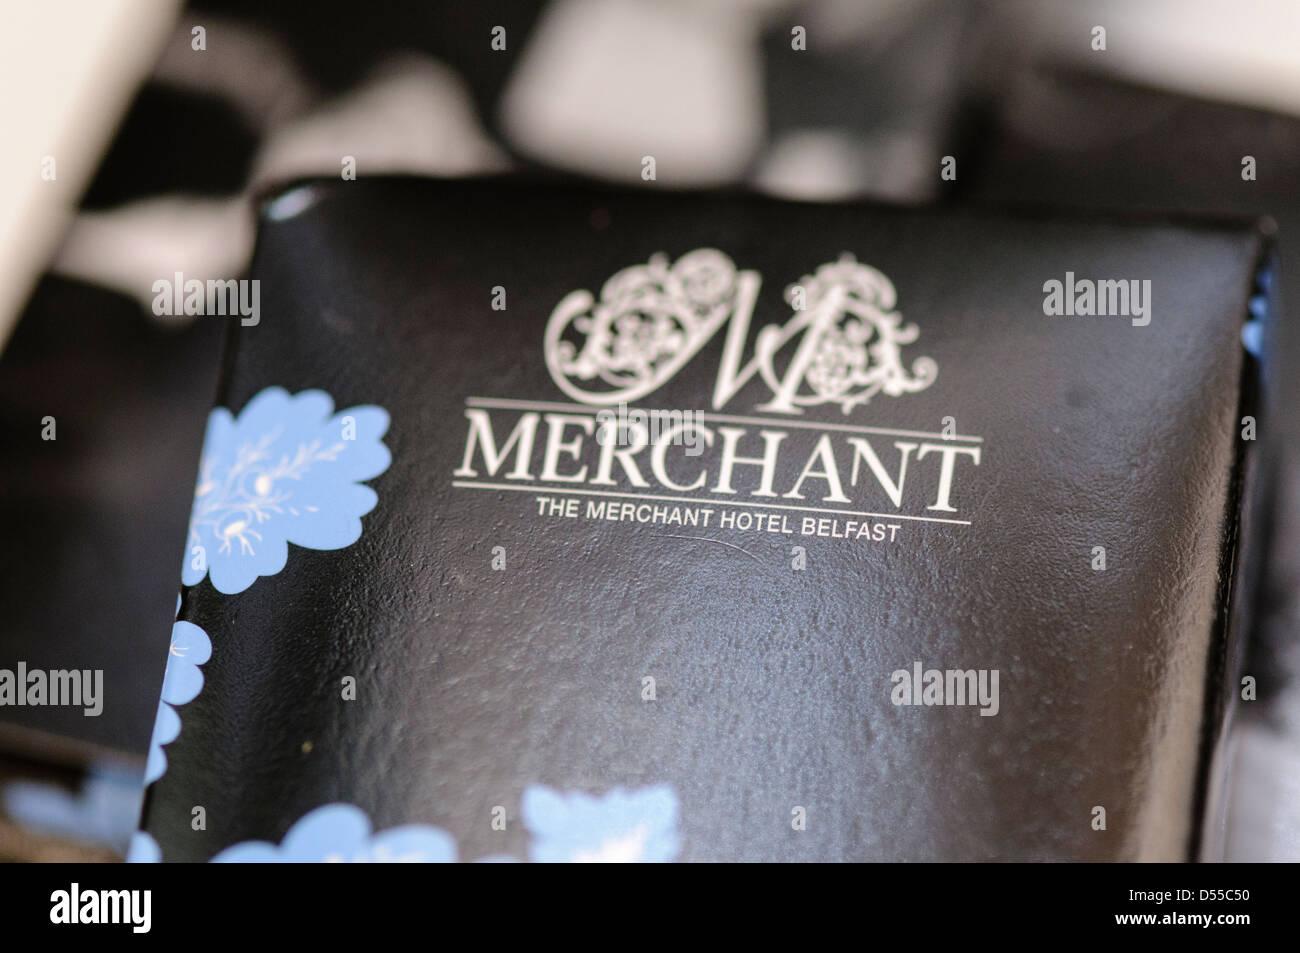 Toiletries in the bathroom of the Merchant Hotel, Belfast - Stock Image